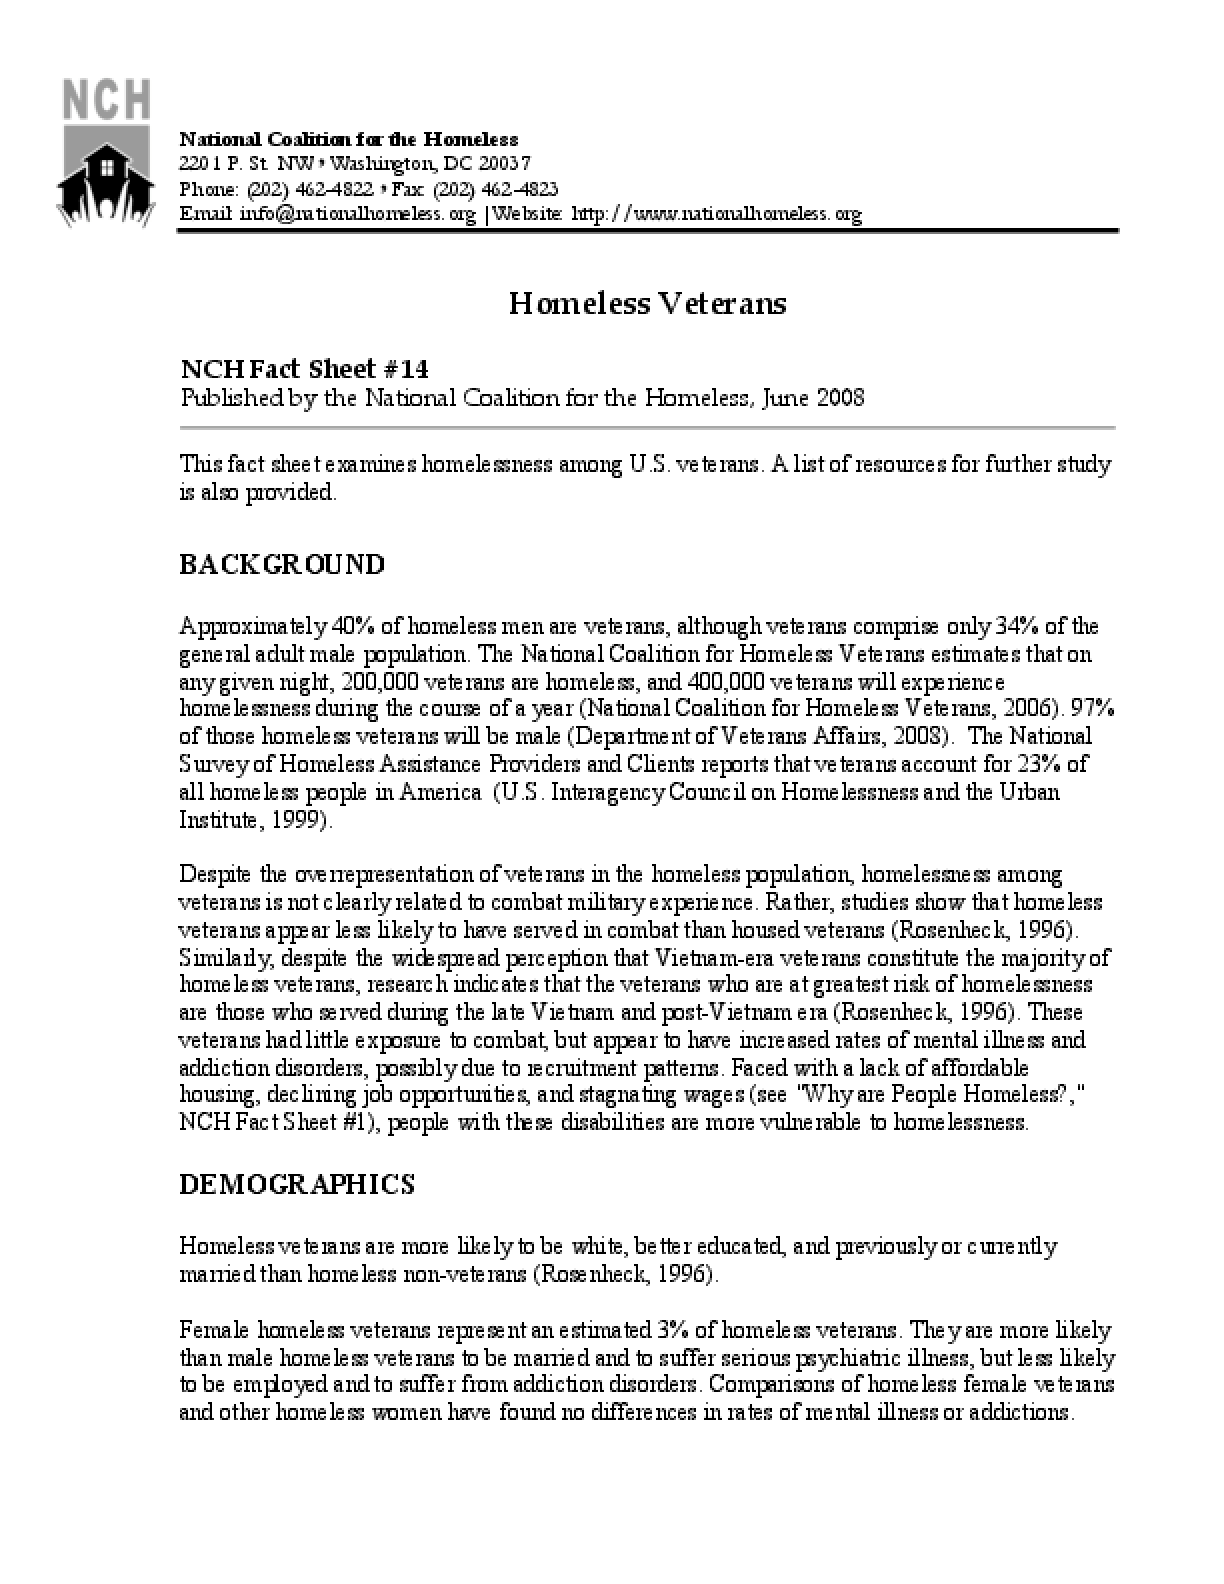 Homeless Veterans Factsheet